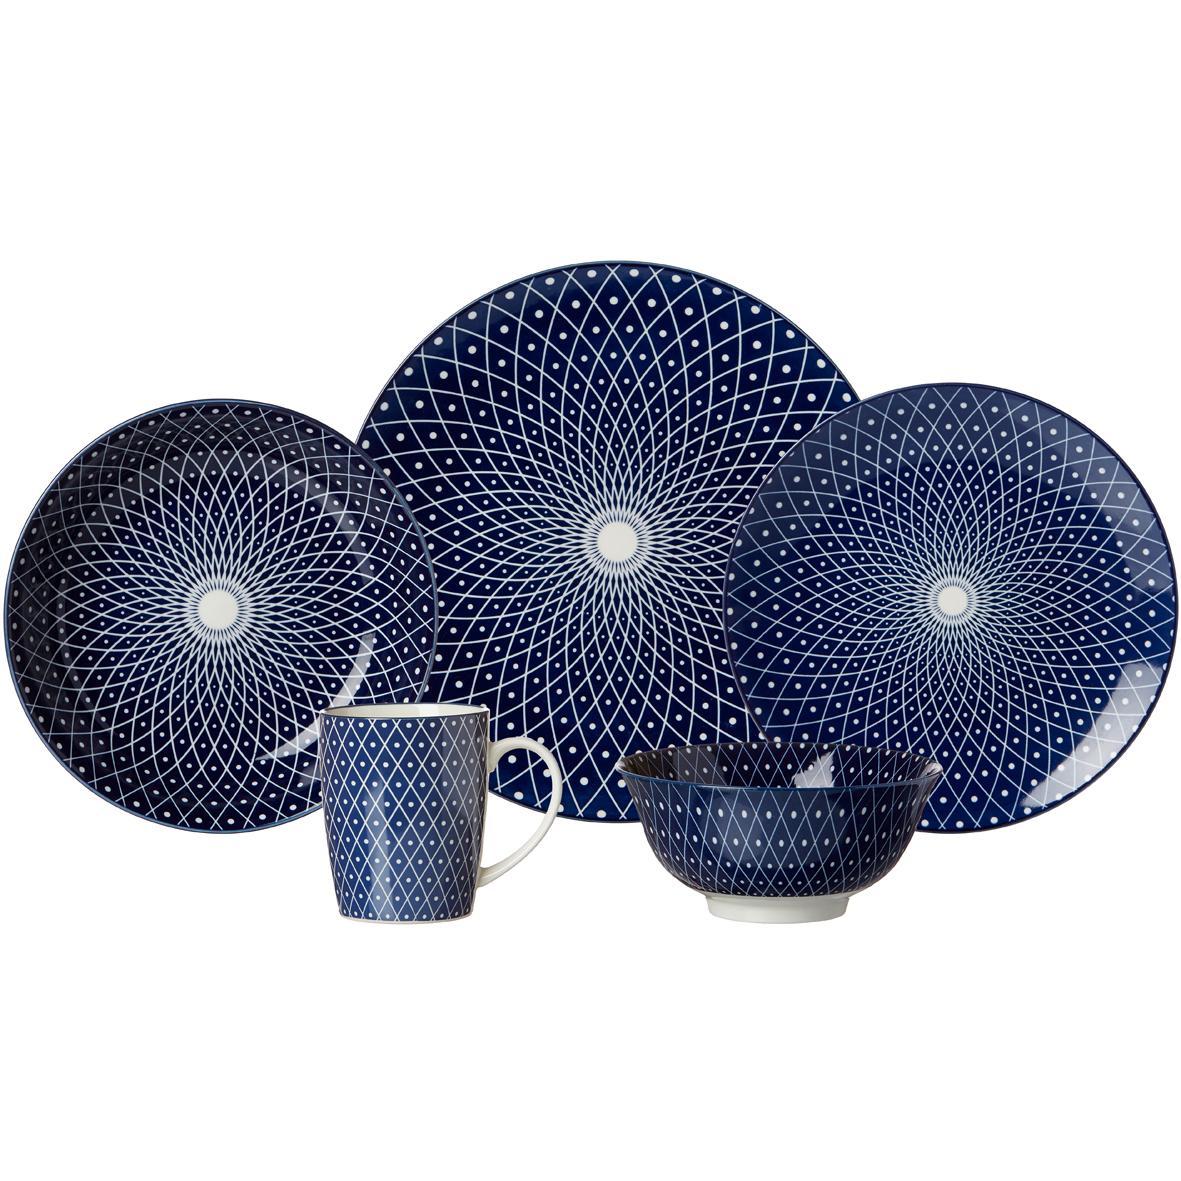 ritzenhoff breker speiseteller set royal reiko 4 teilig 26 5 cm durchmesser. Black Bedroom Furniture Sets. Home Design Ideas